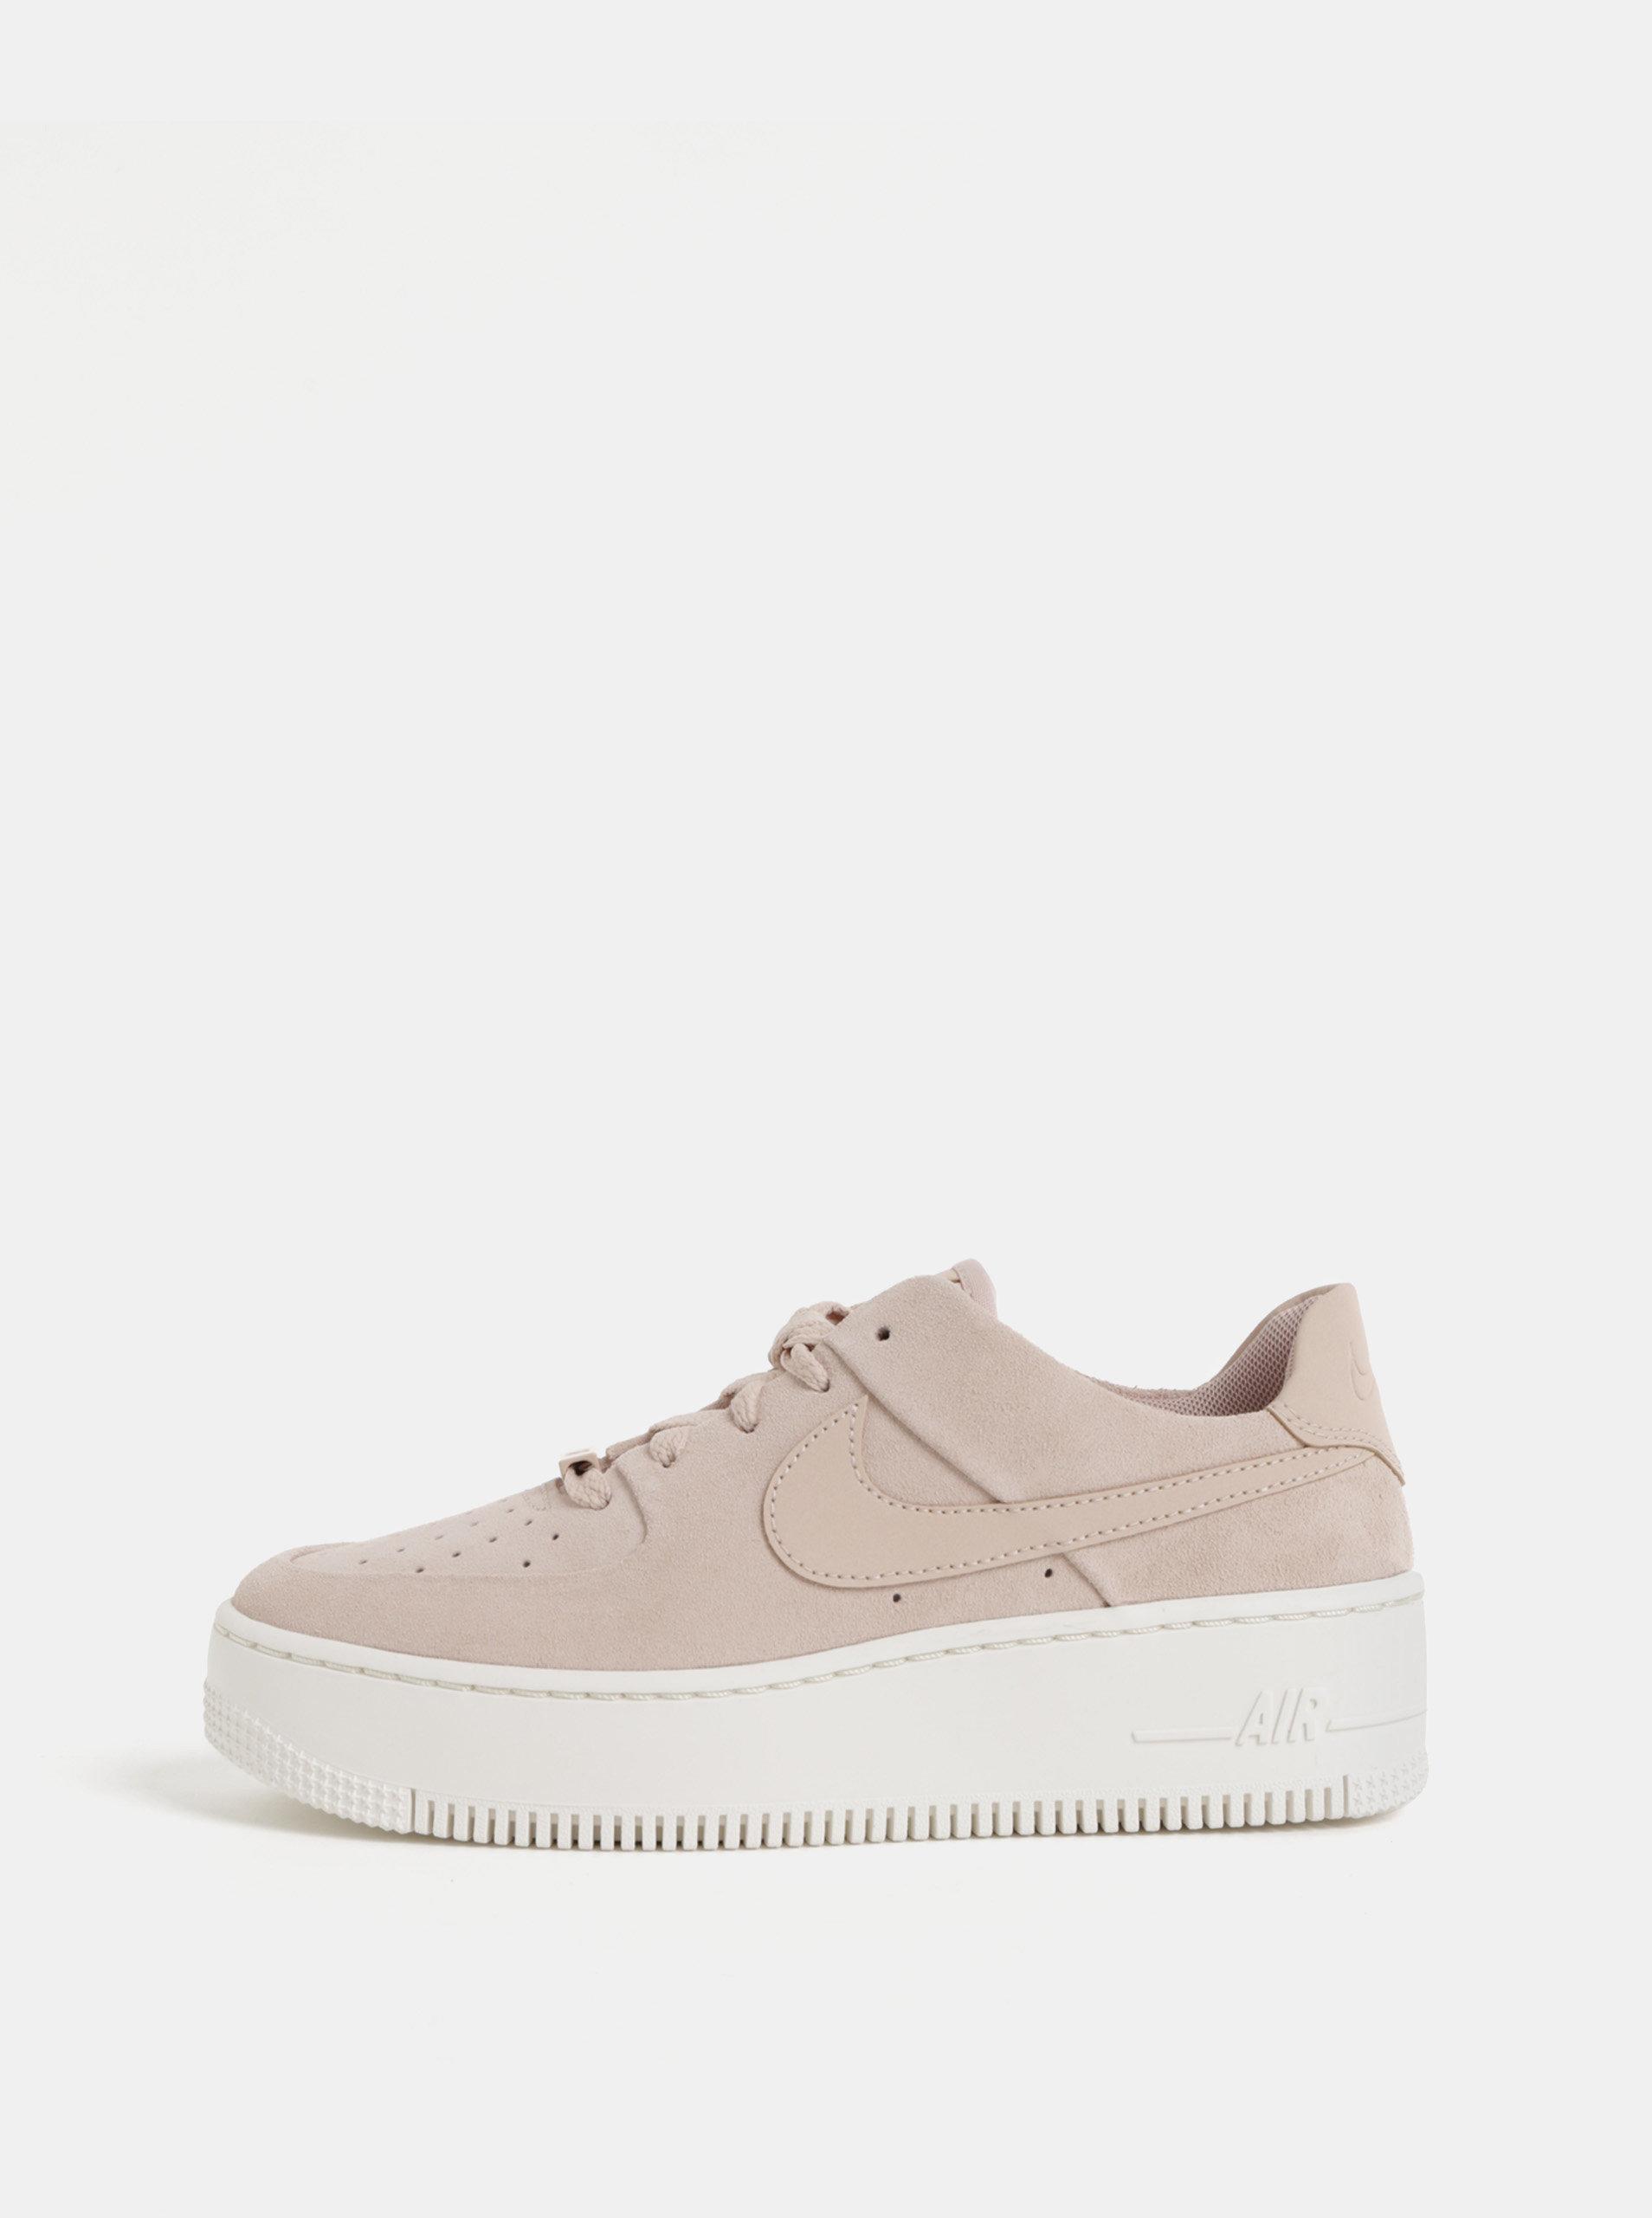 Ružové dámske semišové tenisky na platforme Nike Air Force 1 ... 6ff665d86c4